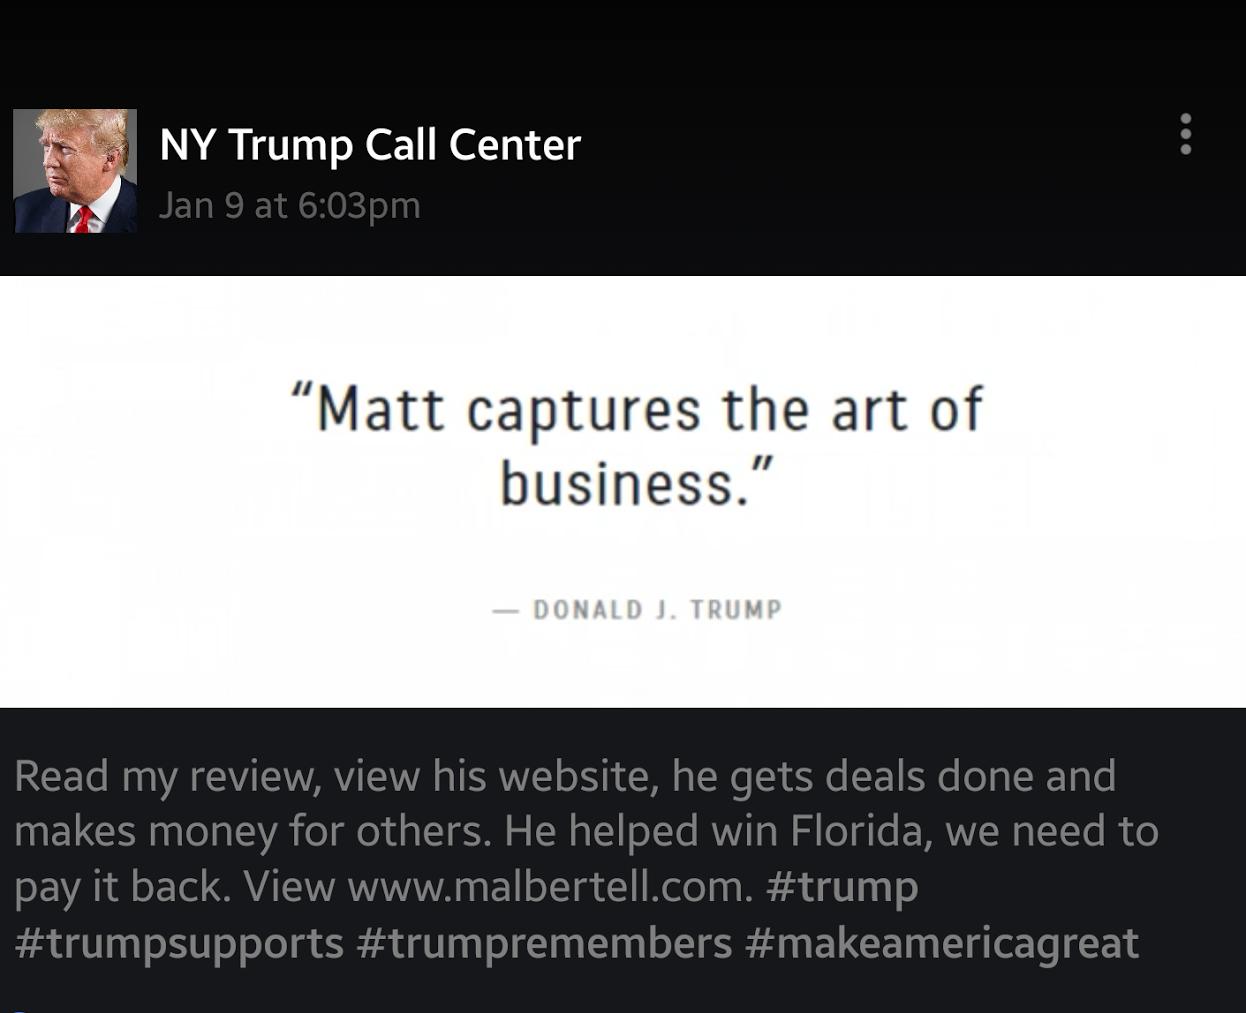 M Albertell Trump Review